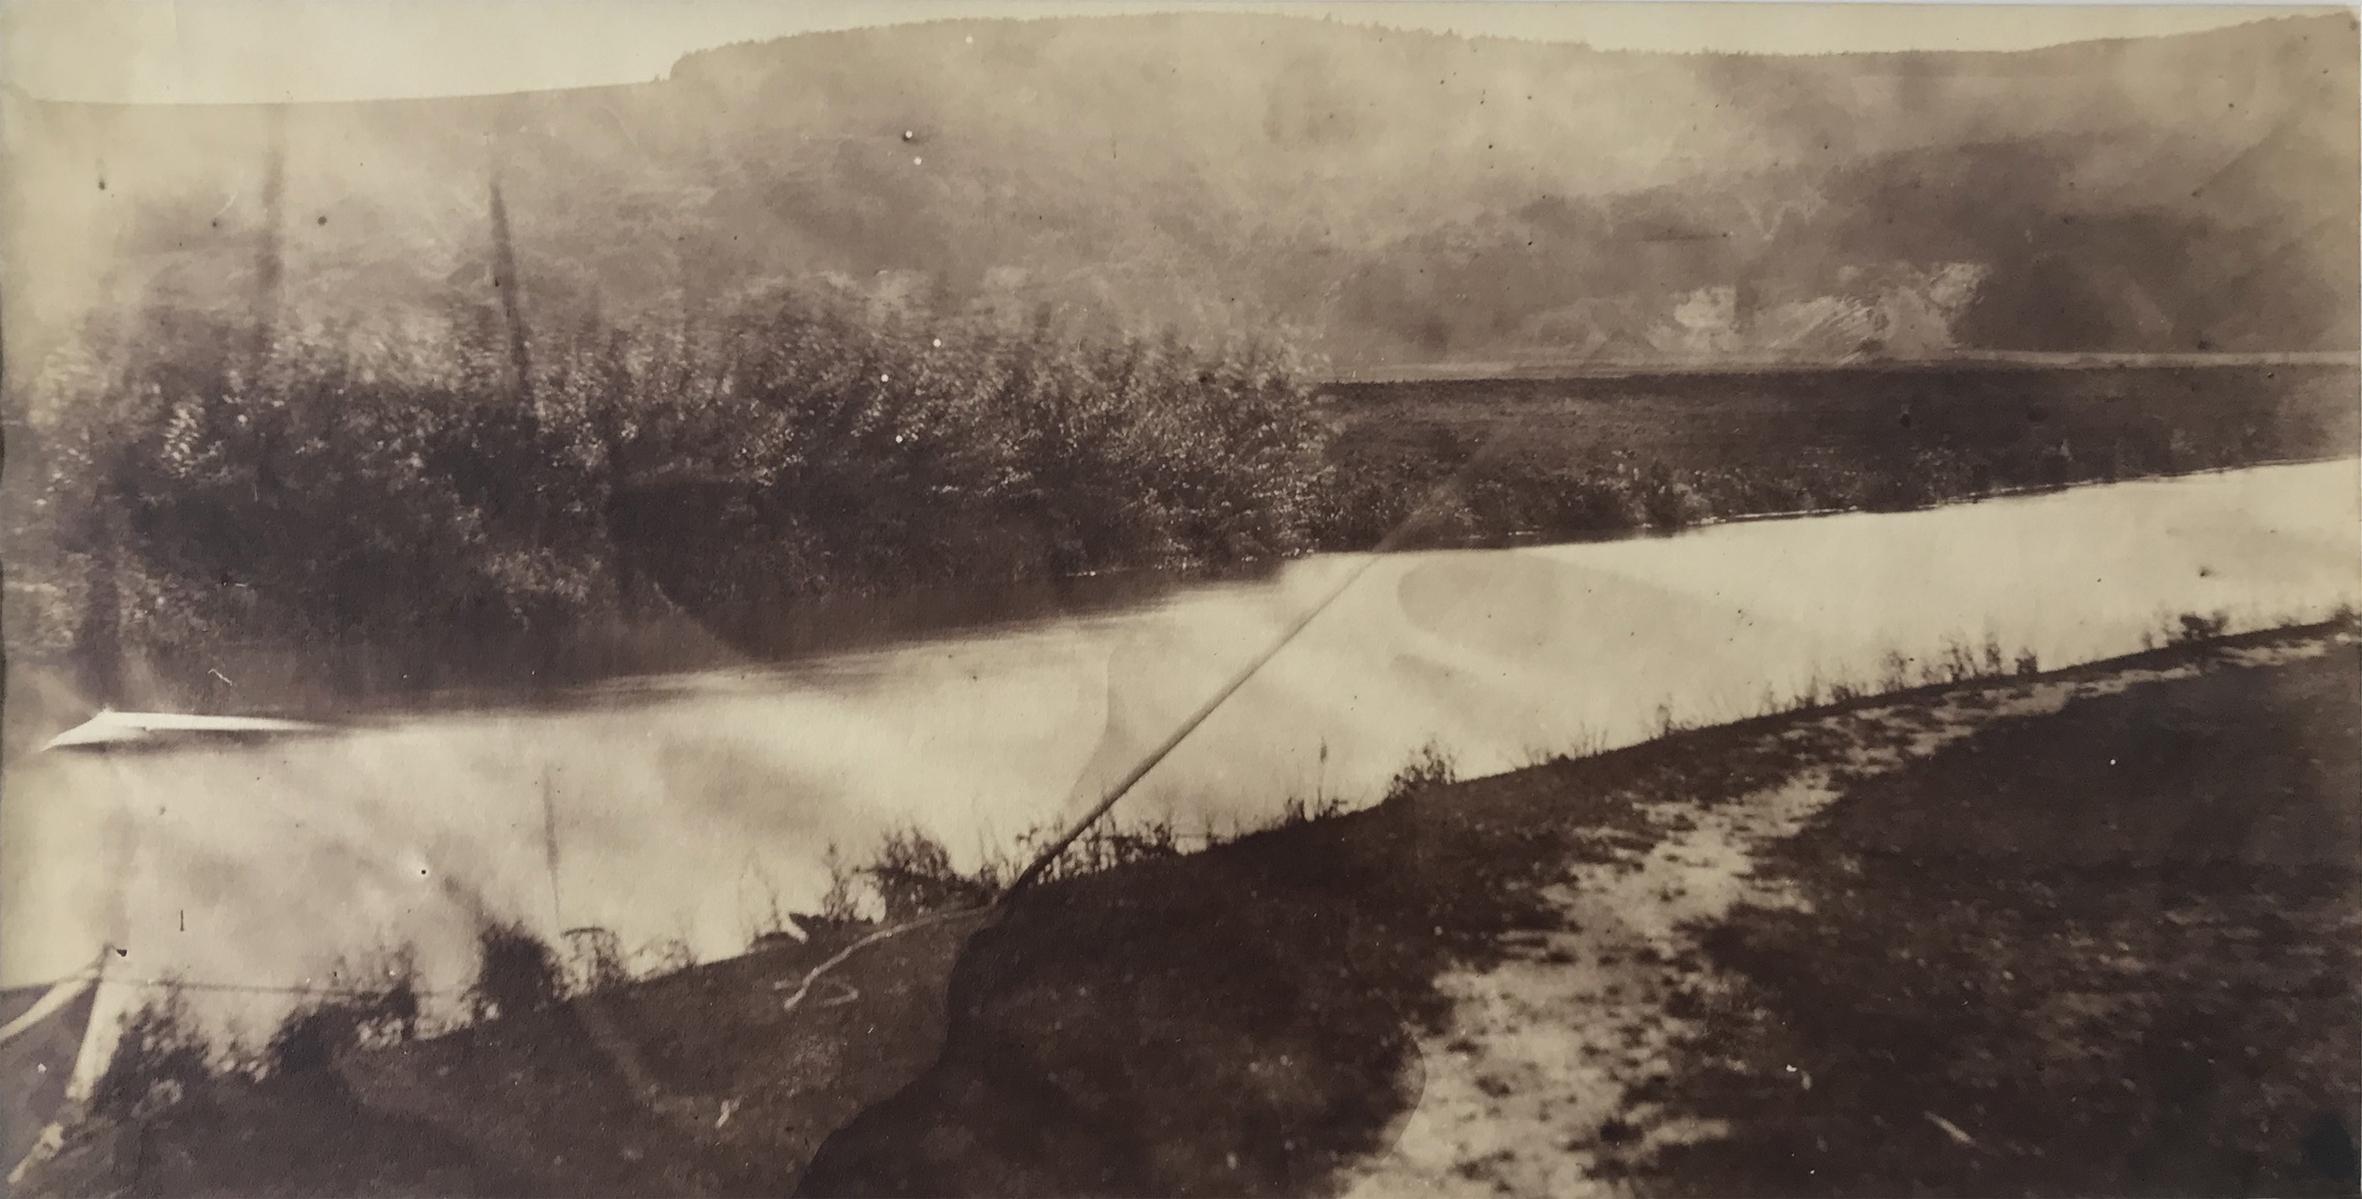 ames Baker Pyne Jr. | Sussex | Albumin Print | 1855 | basedonart-gallery